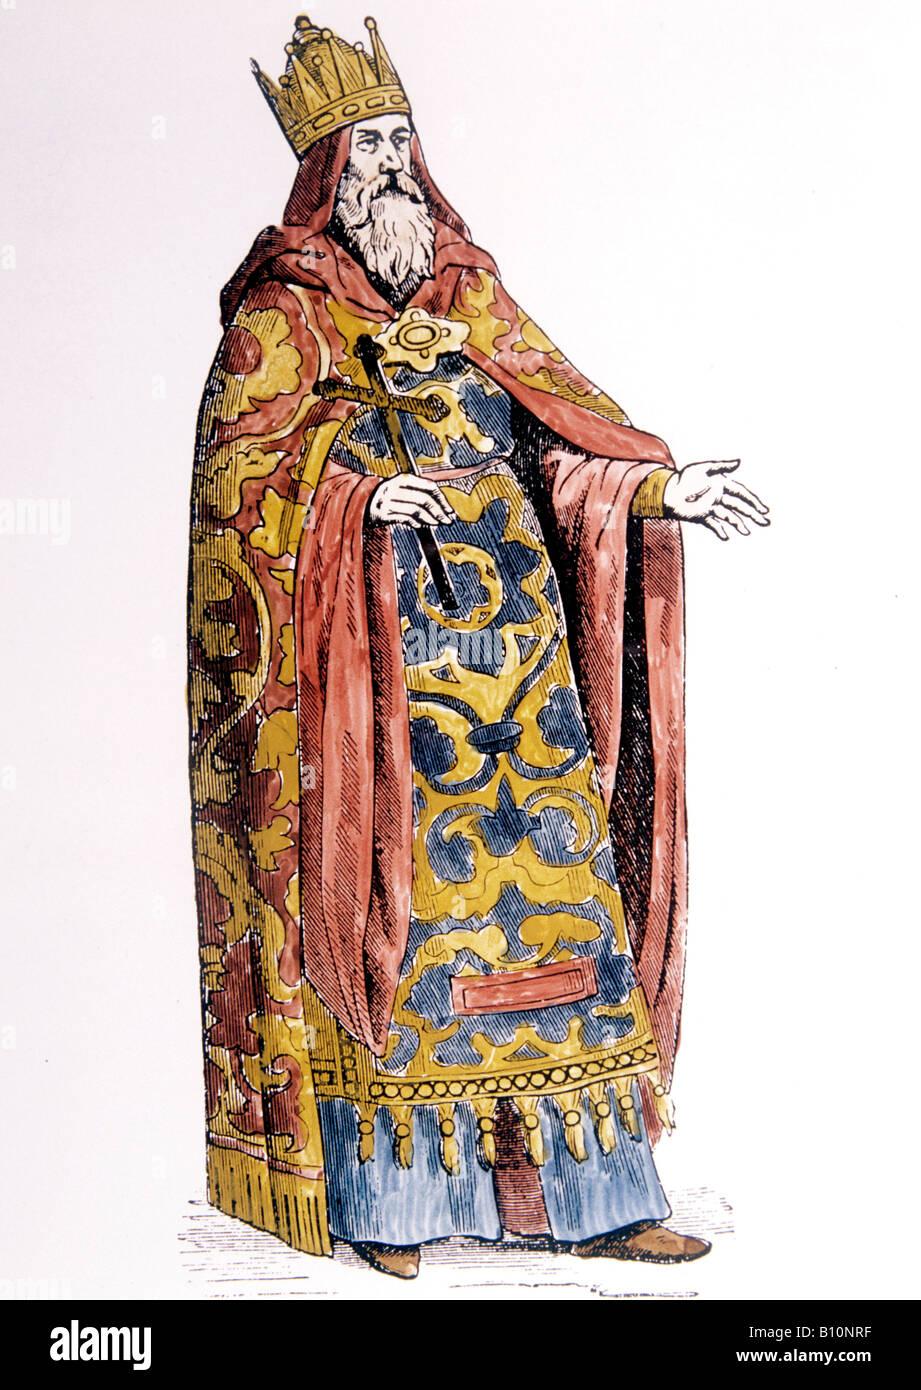 Prester John mittelalterlichen Holzschnitt alte Kunst & Architektur Sammlung Stockbild